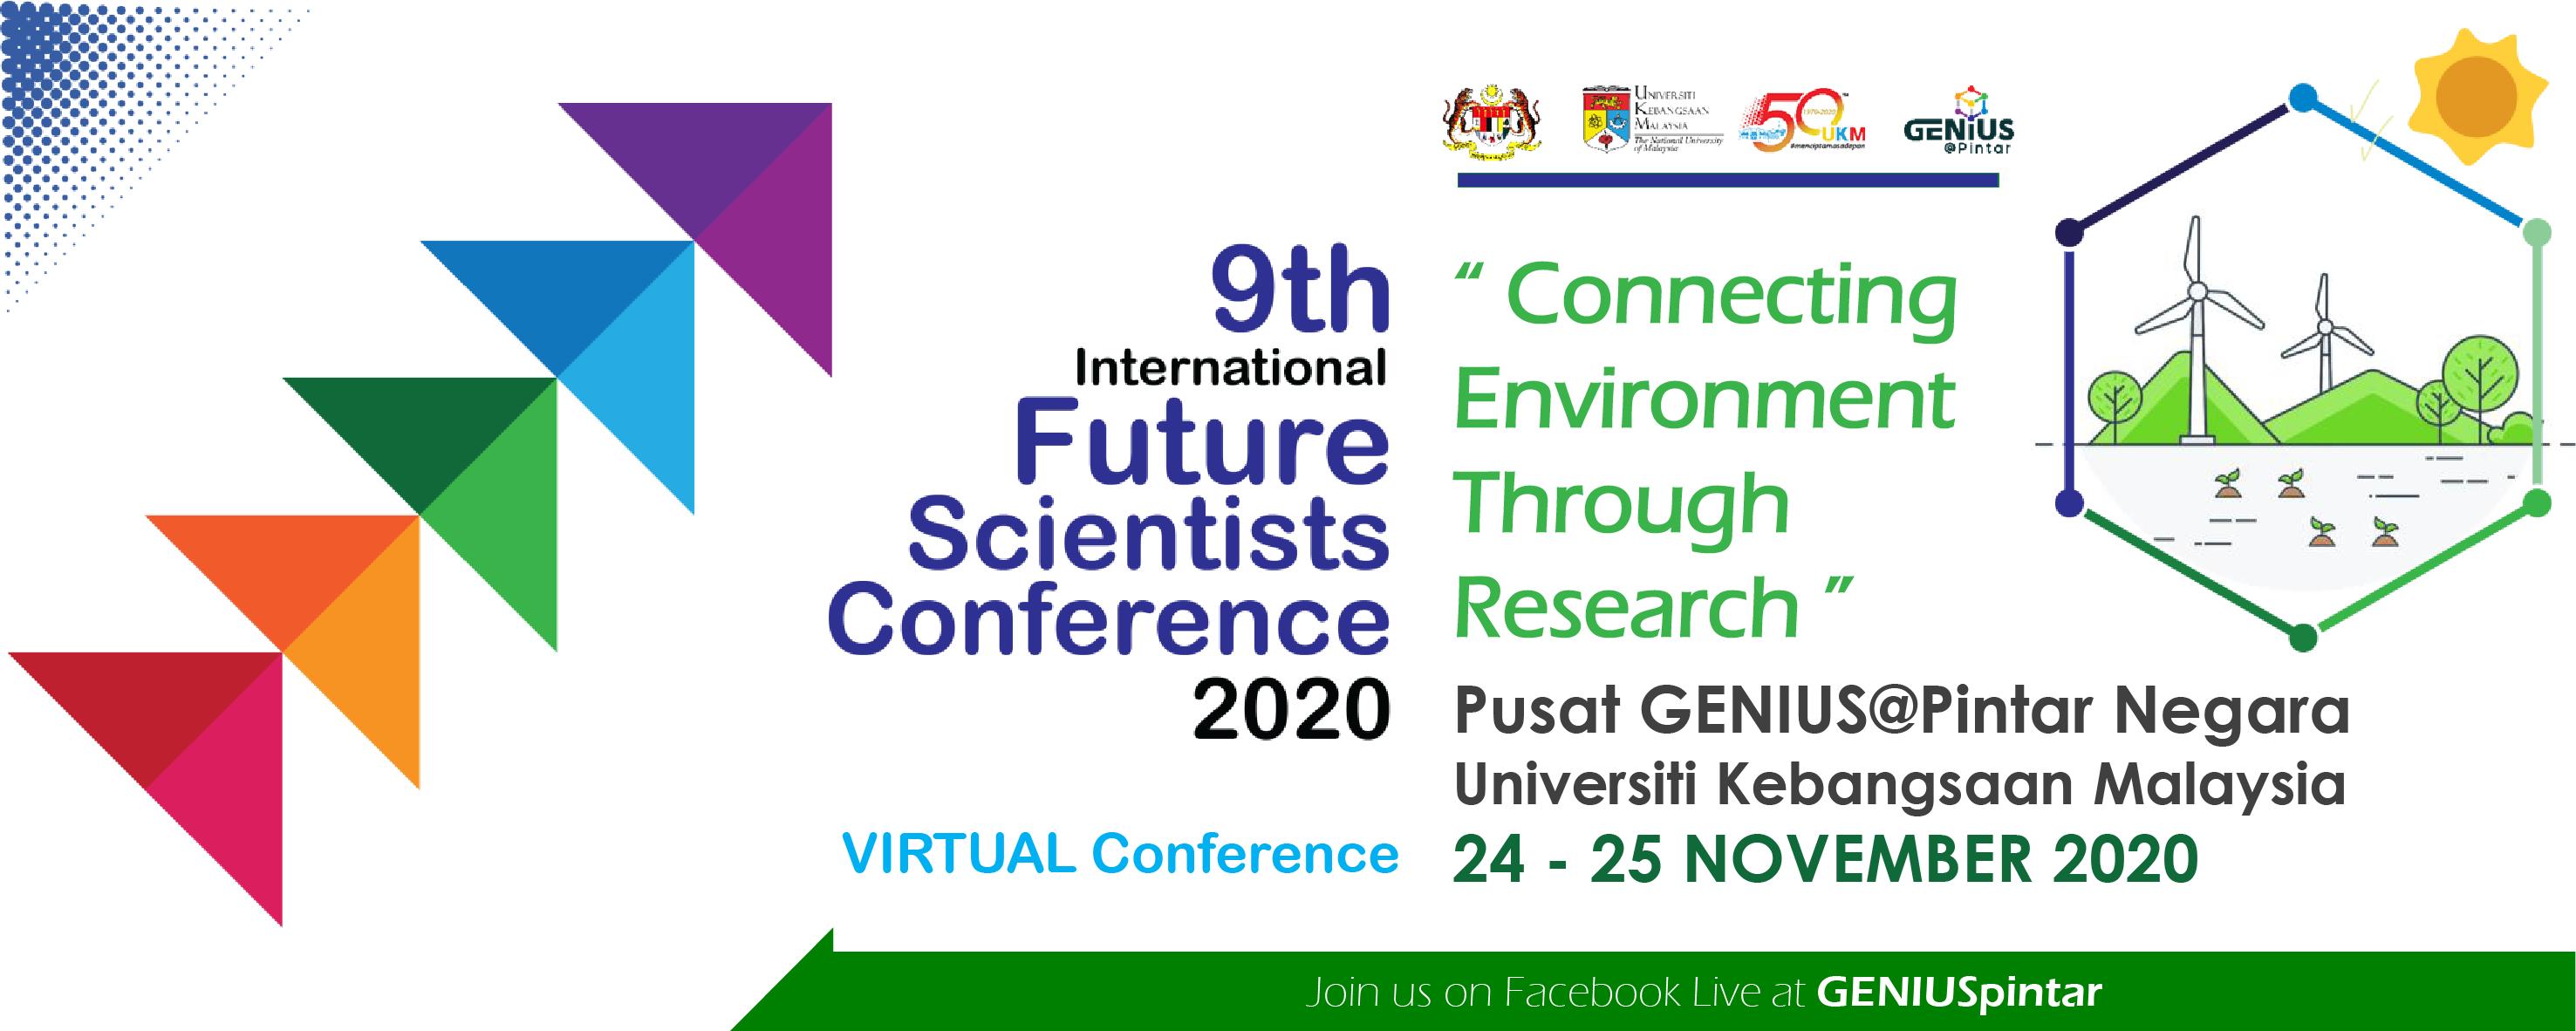 International Future Scientist Conference 9th